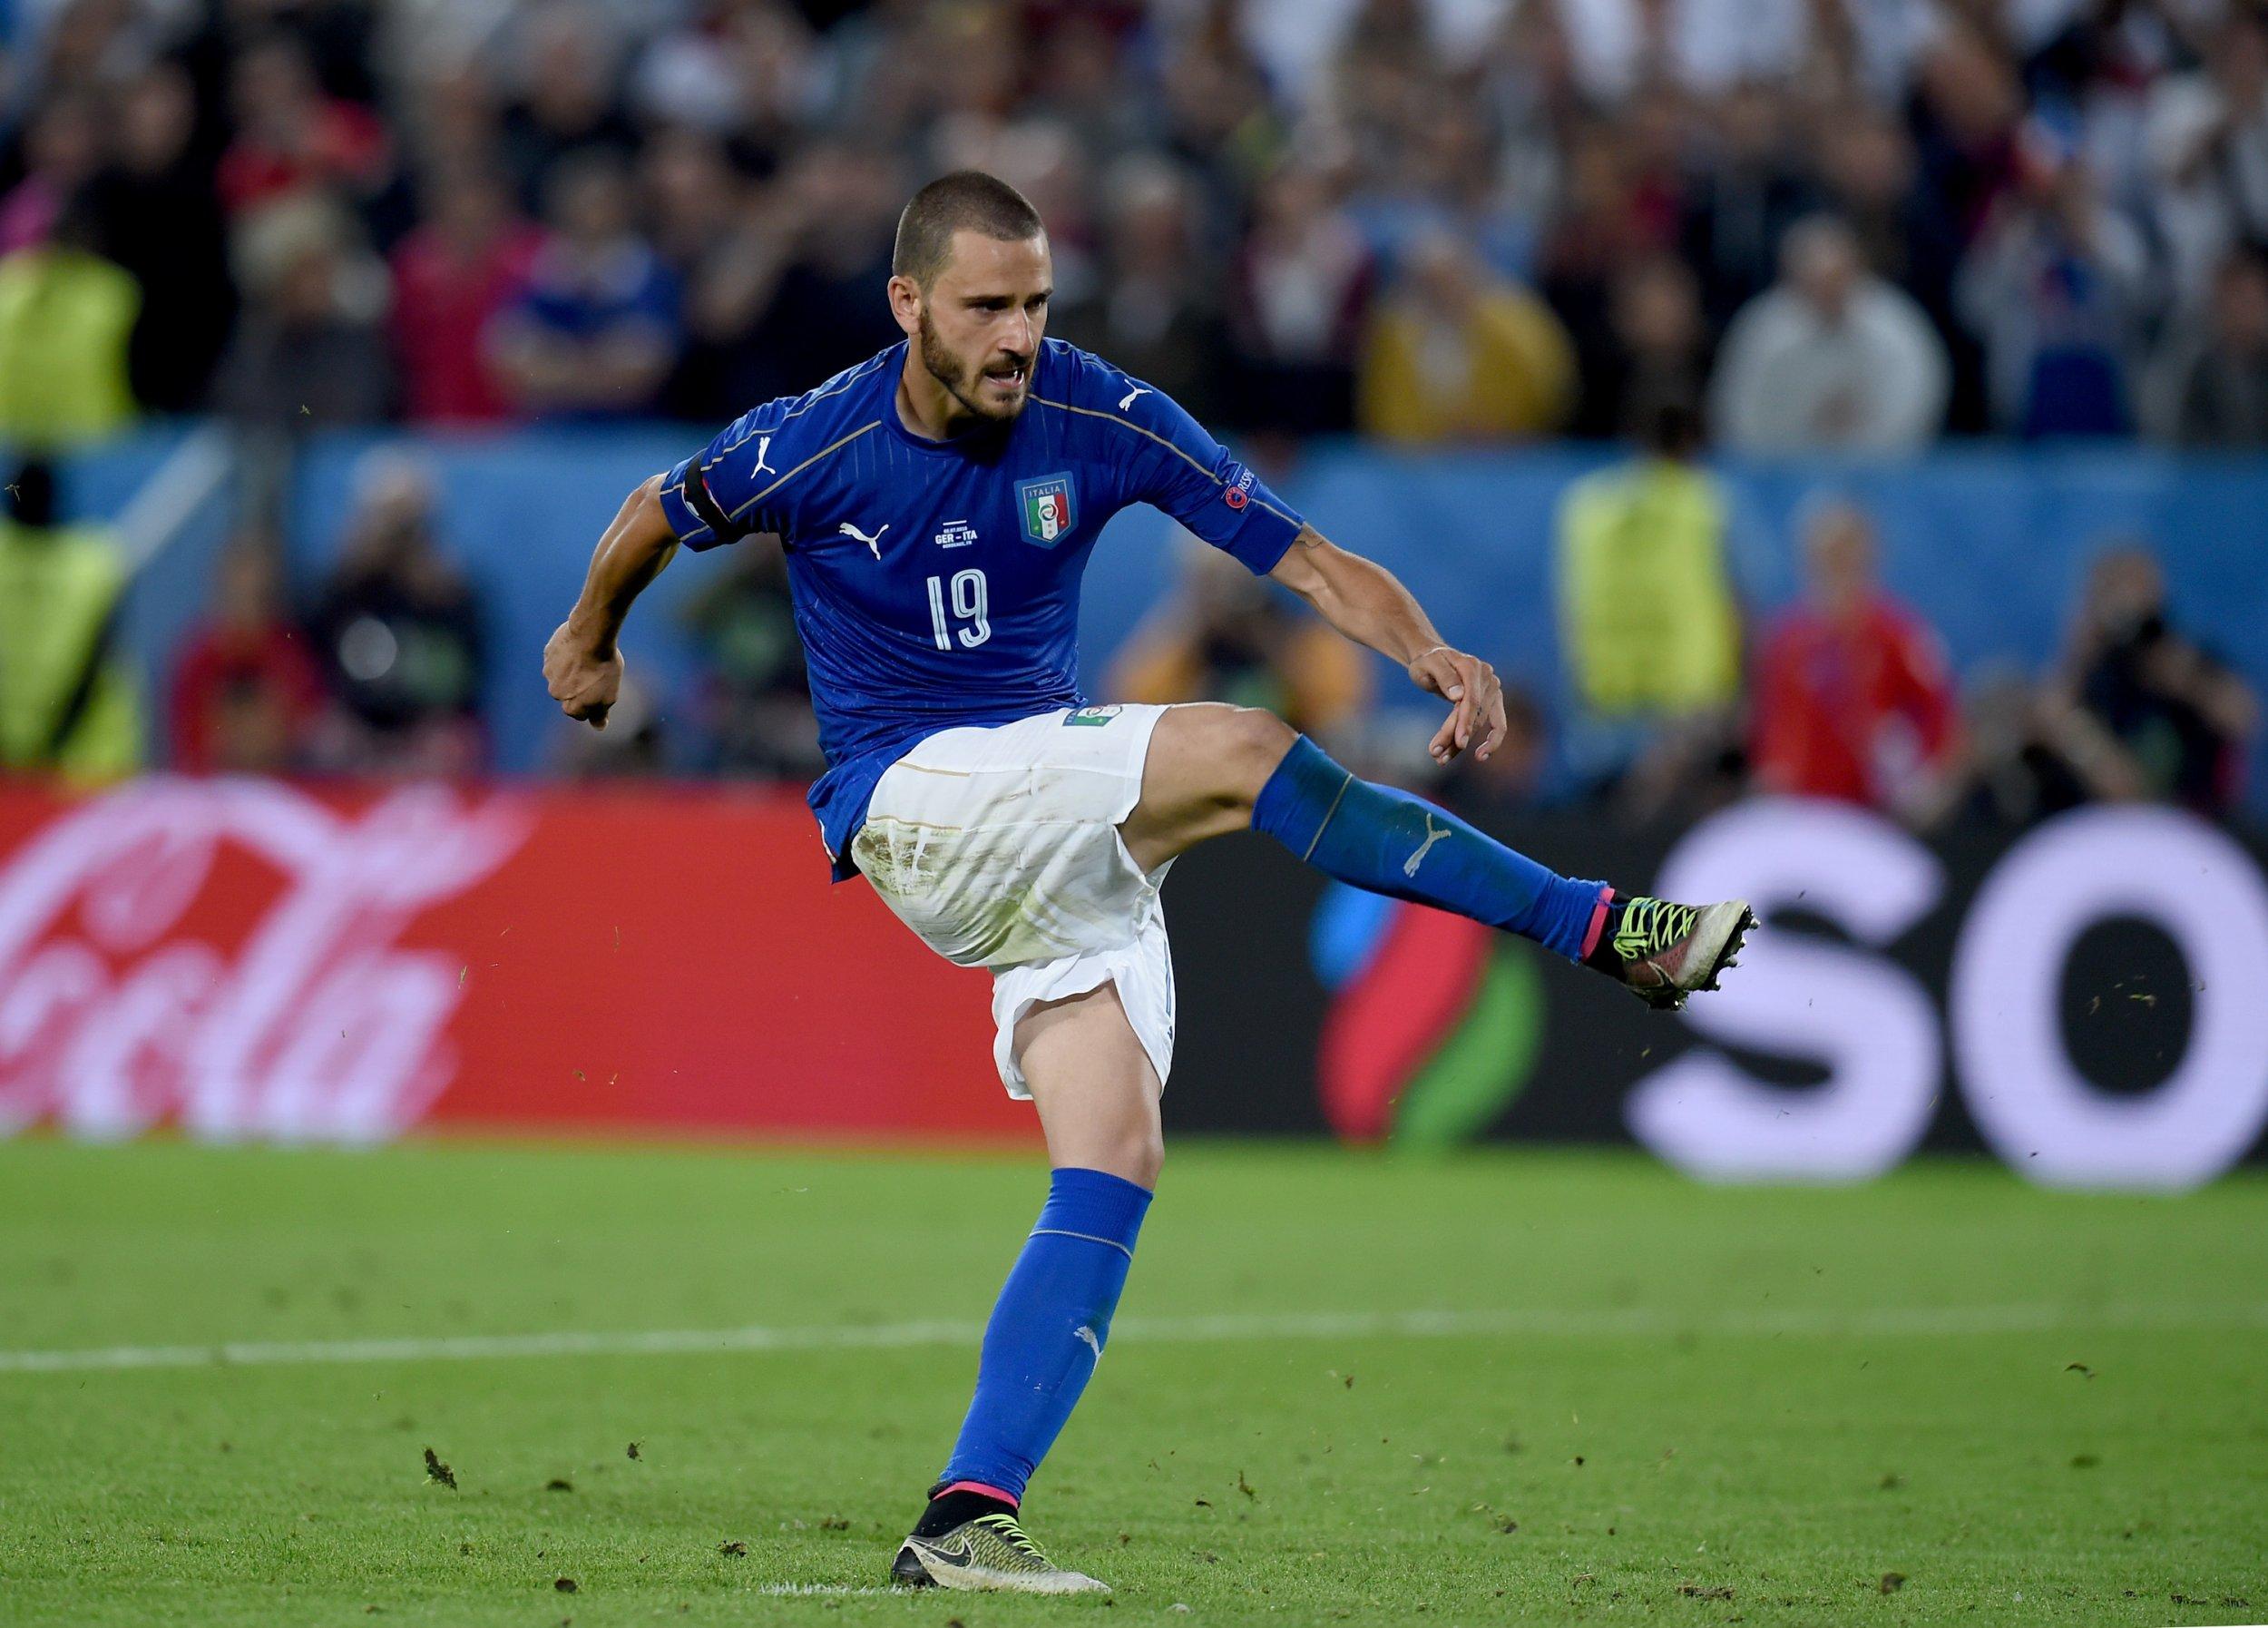 Juventus and Italy defender Leonardo Bonucci